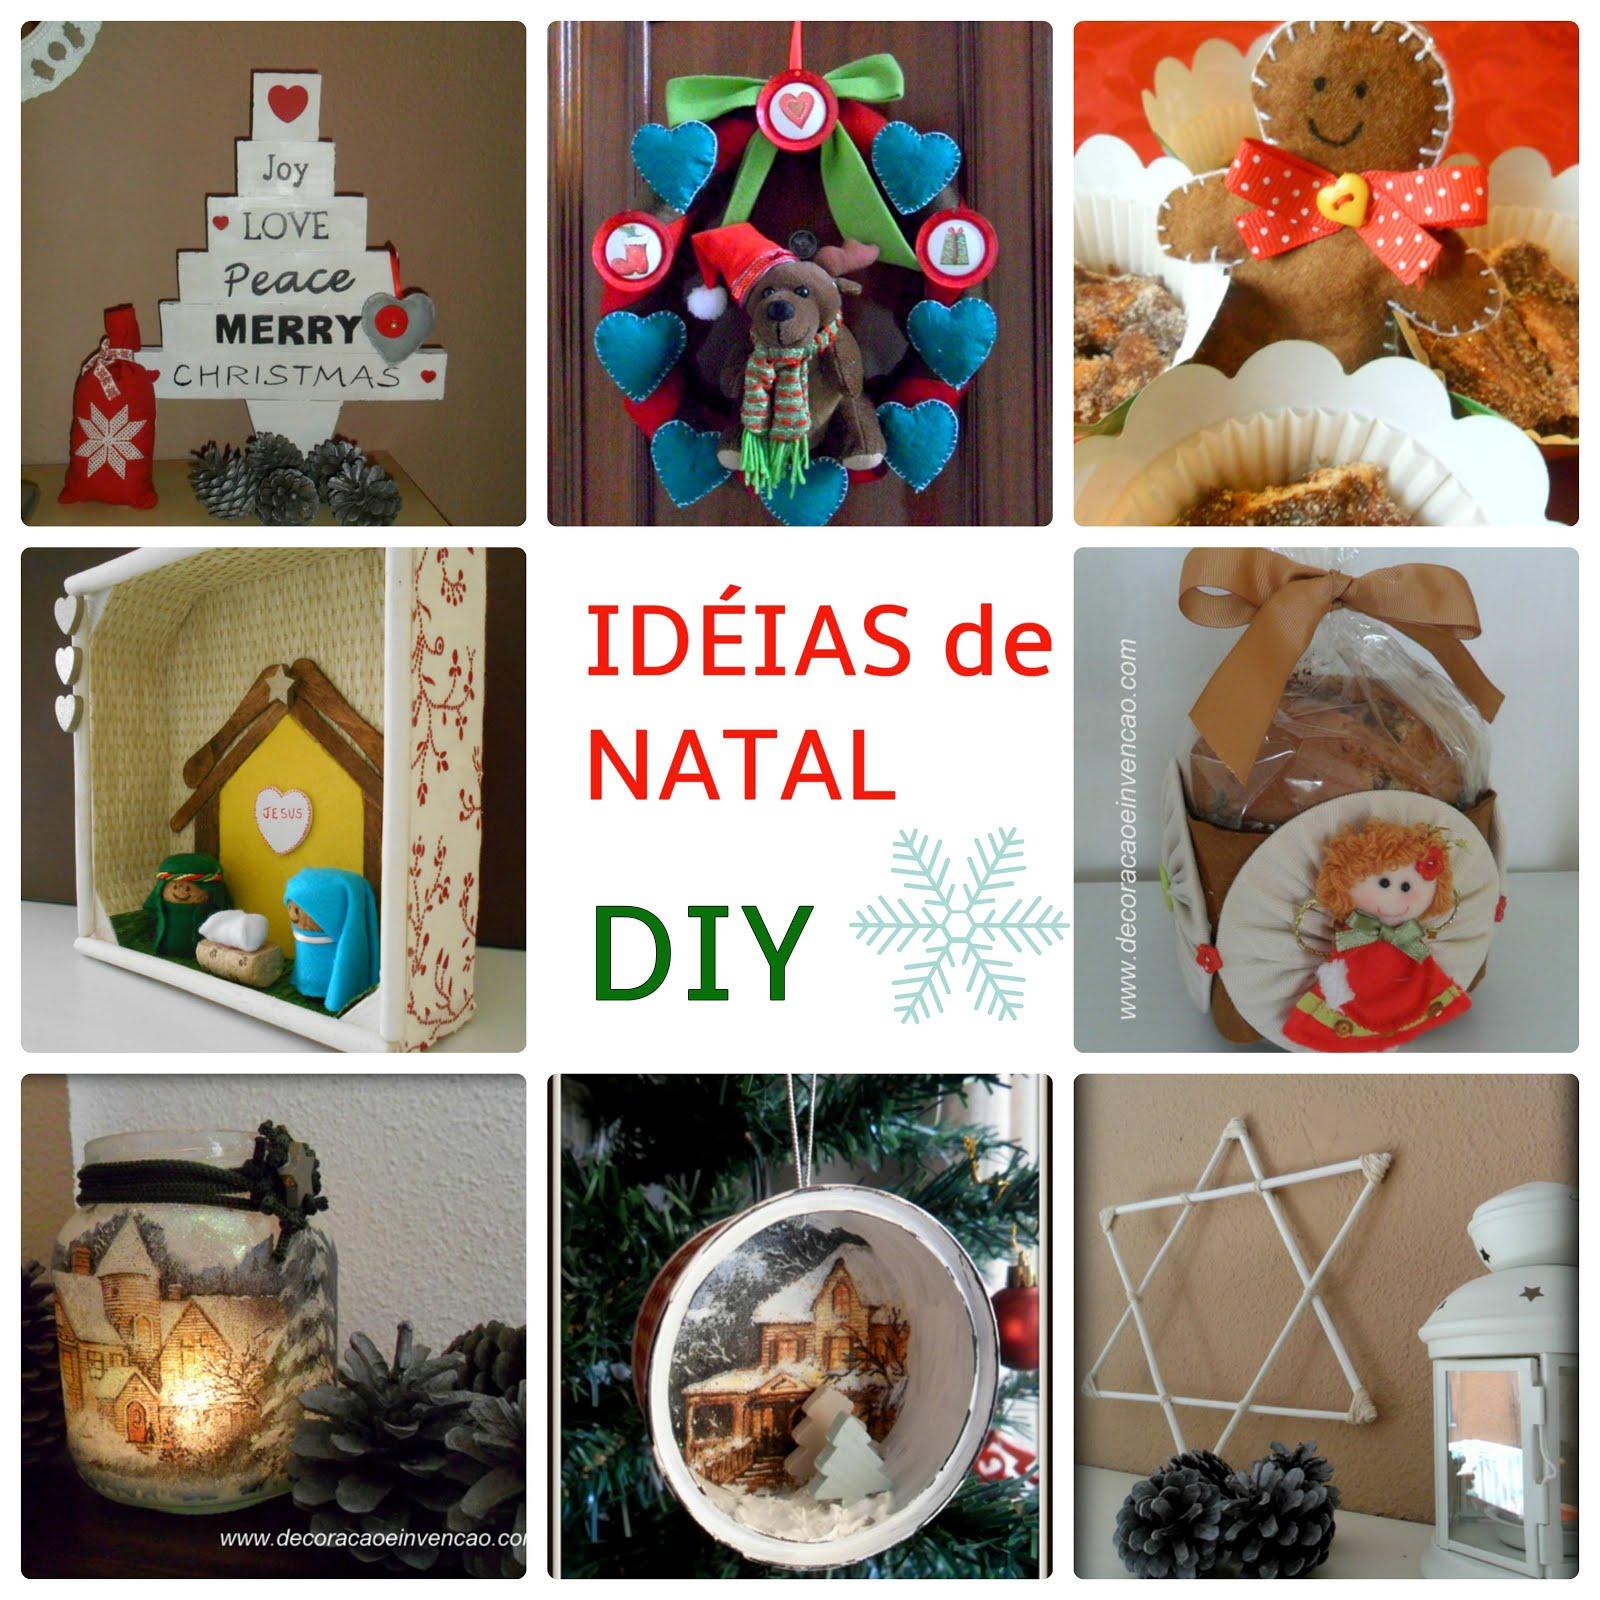 Idéias de Natal -DIY